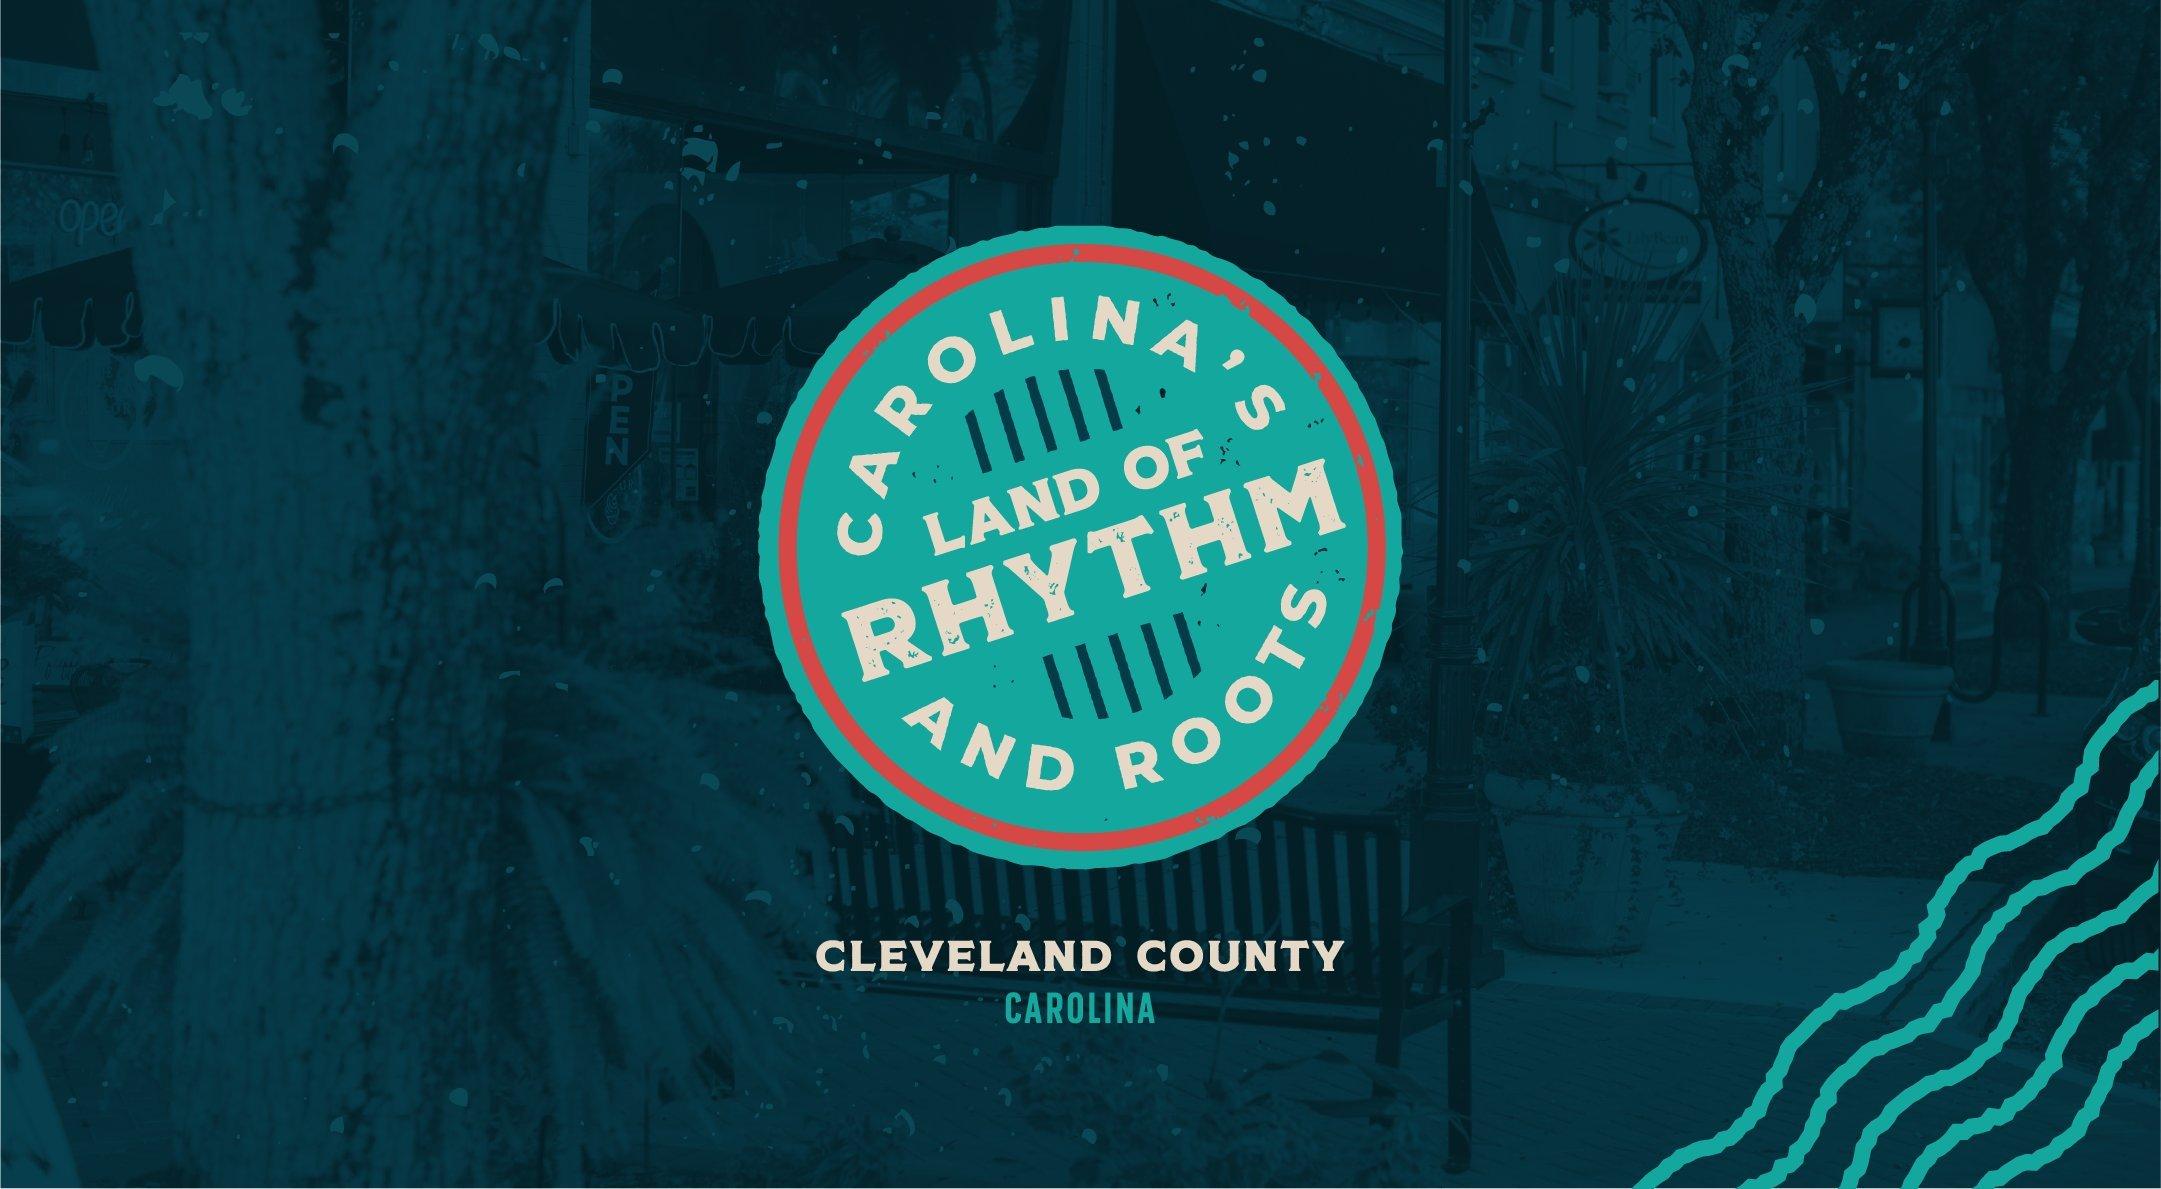 Visit Cleveland County logo